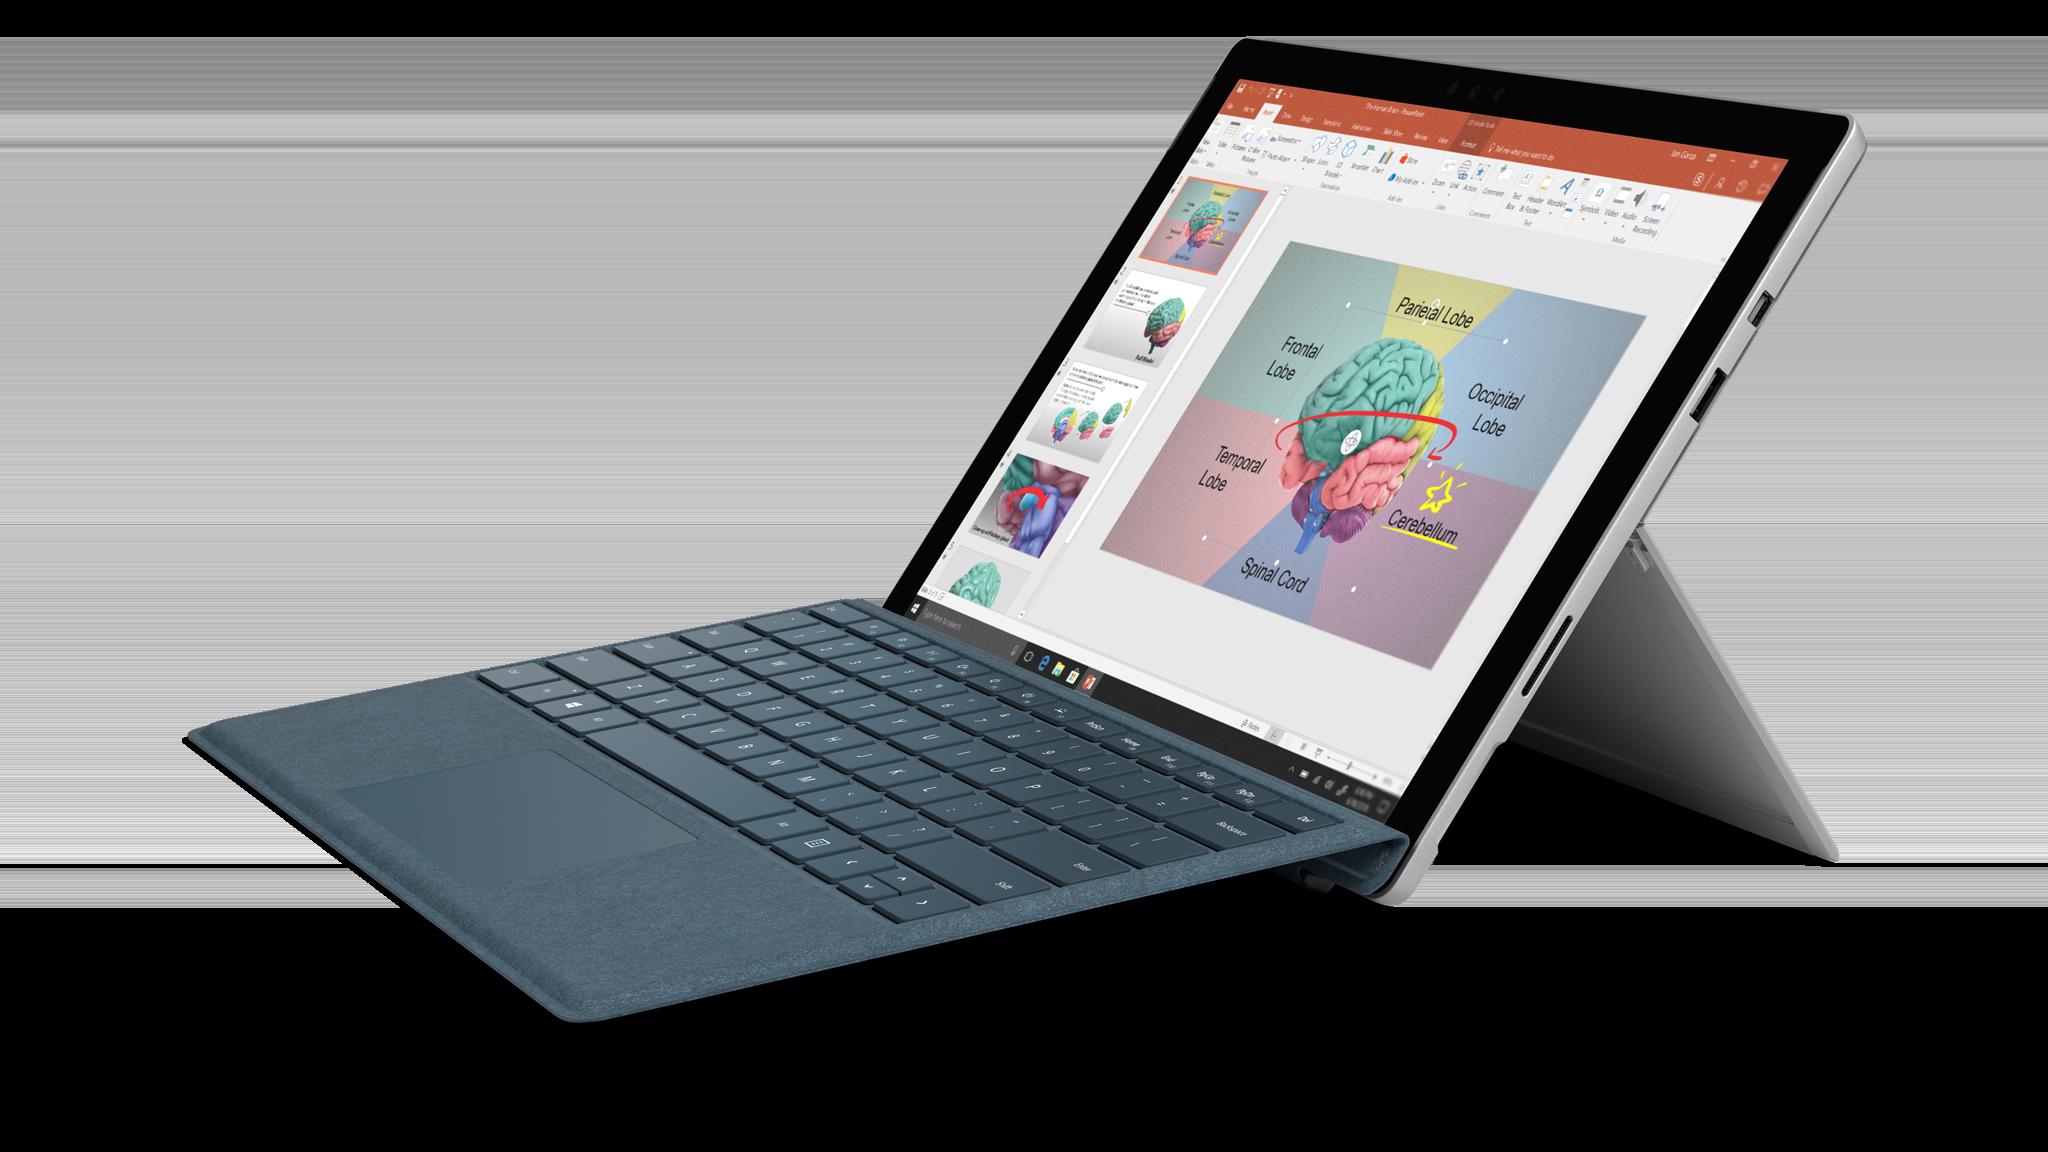 Surface Pro 측면 보기